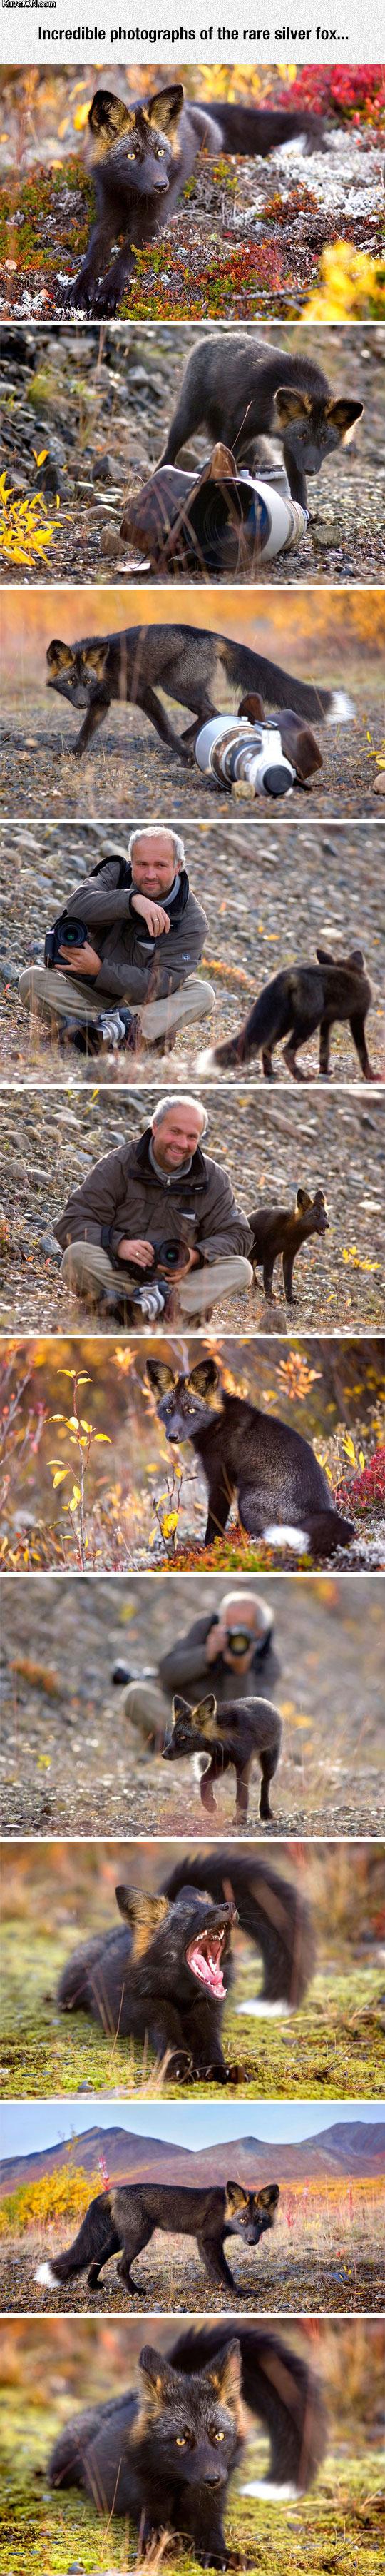 such_a_beautiful_animal.jpg